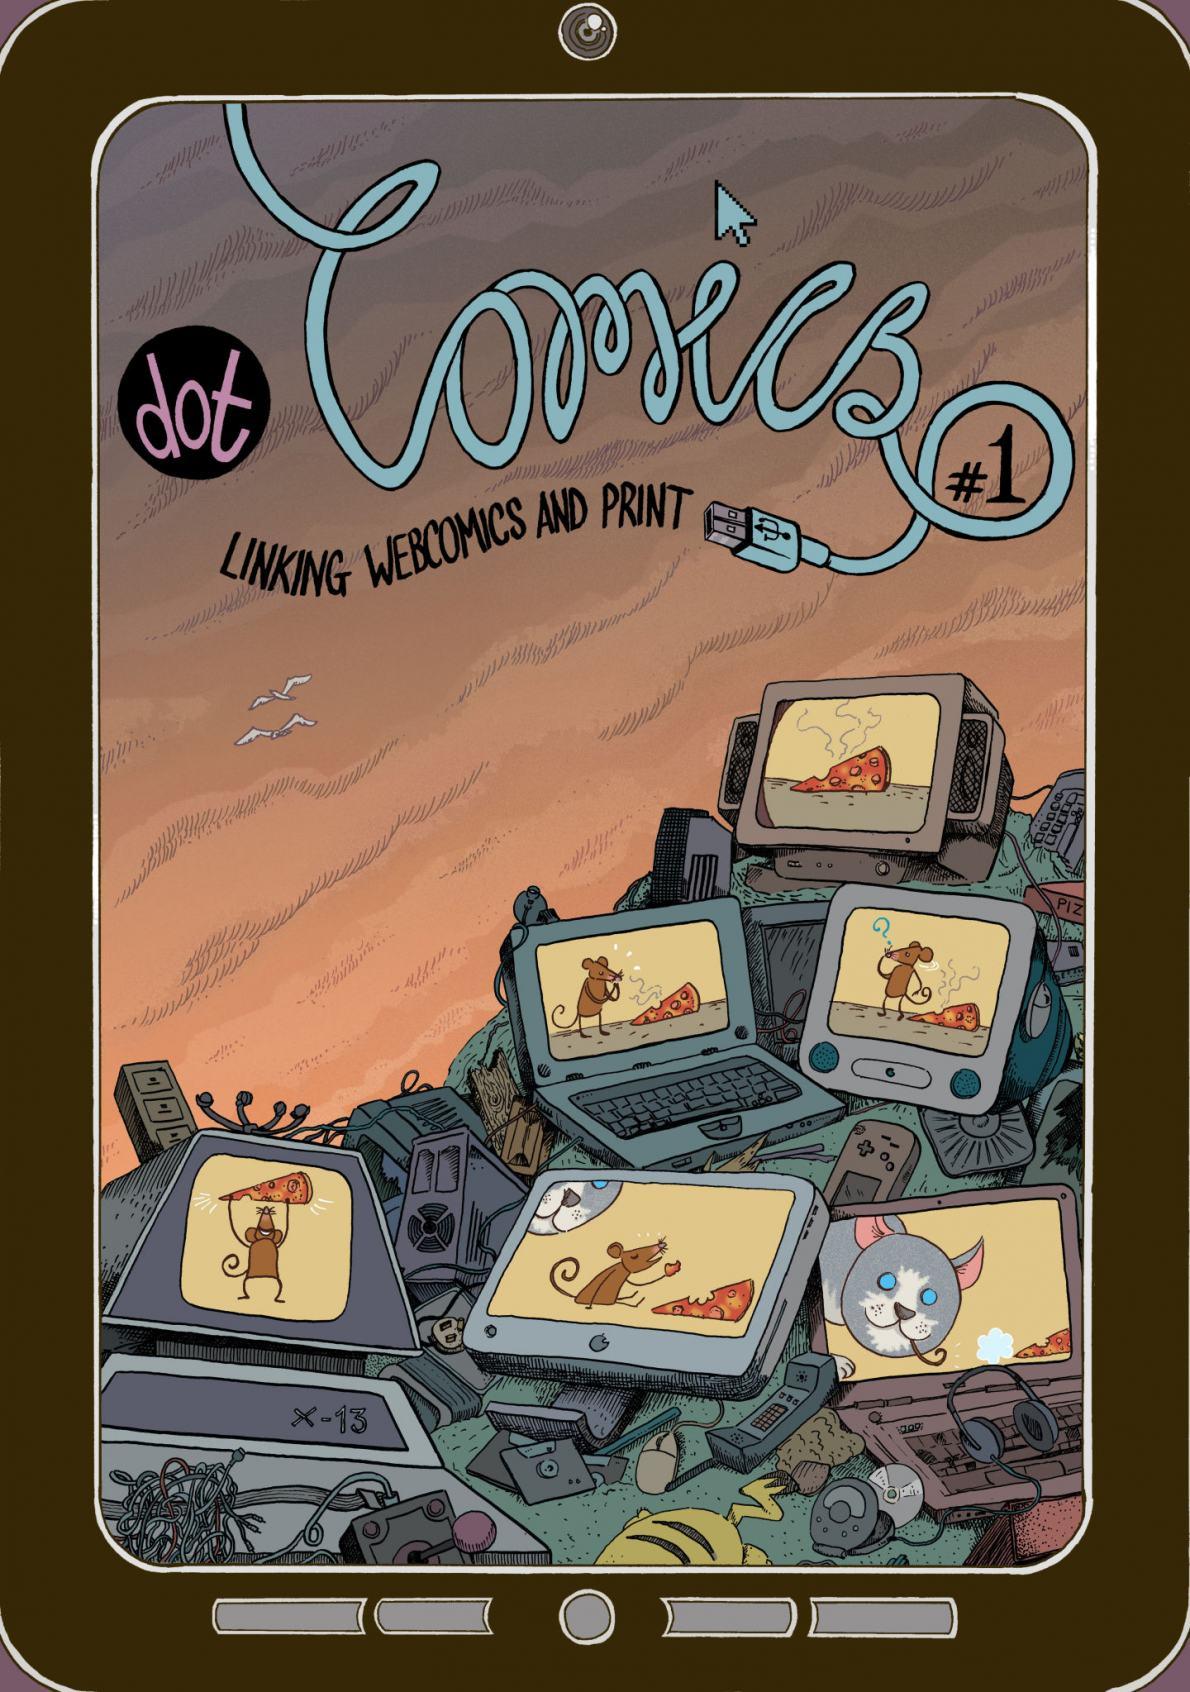 A comics anthology linking web-comics and print. Edited by myself and Elliot Baggott.